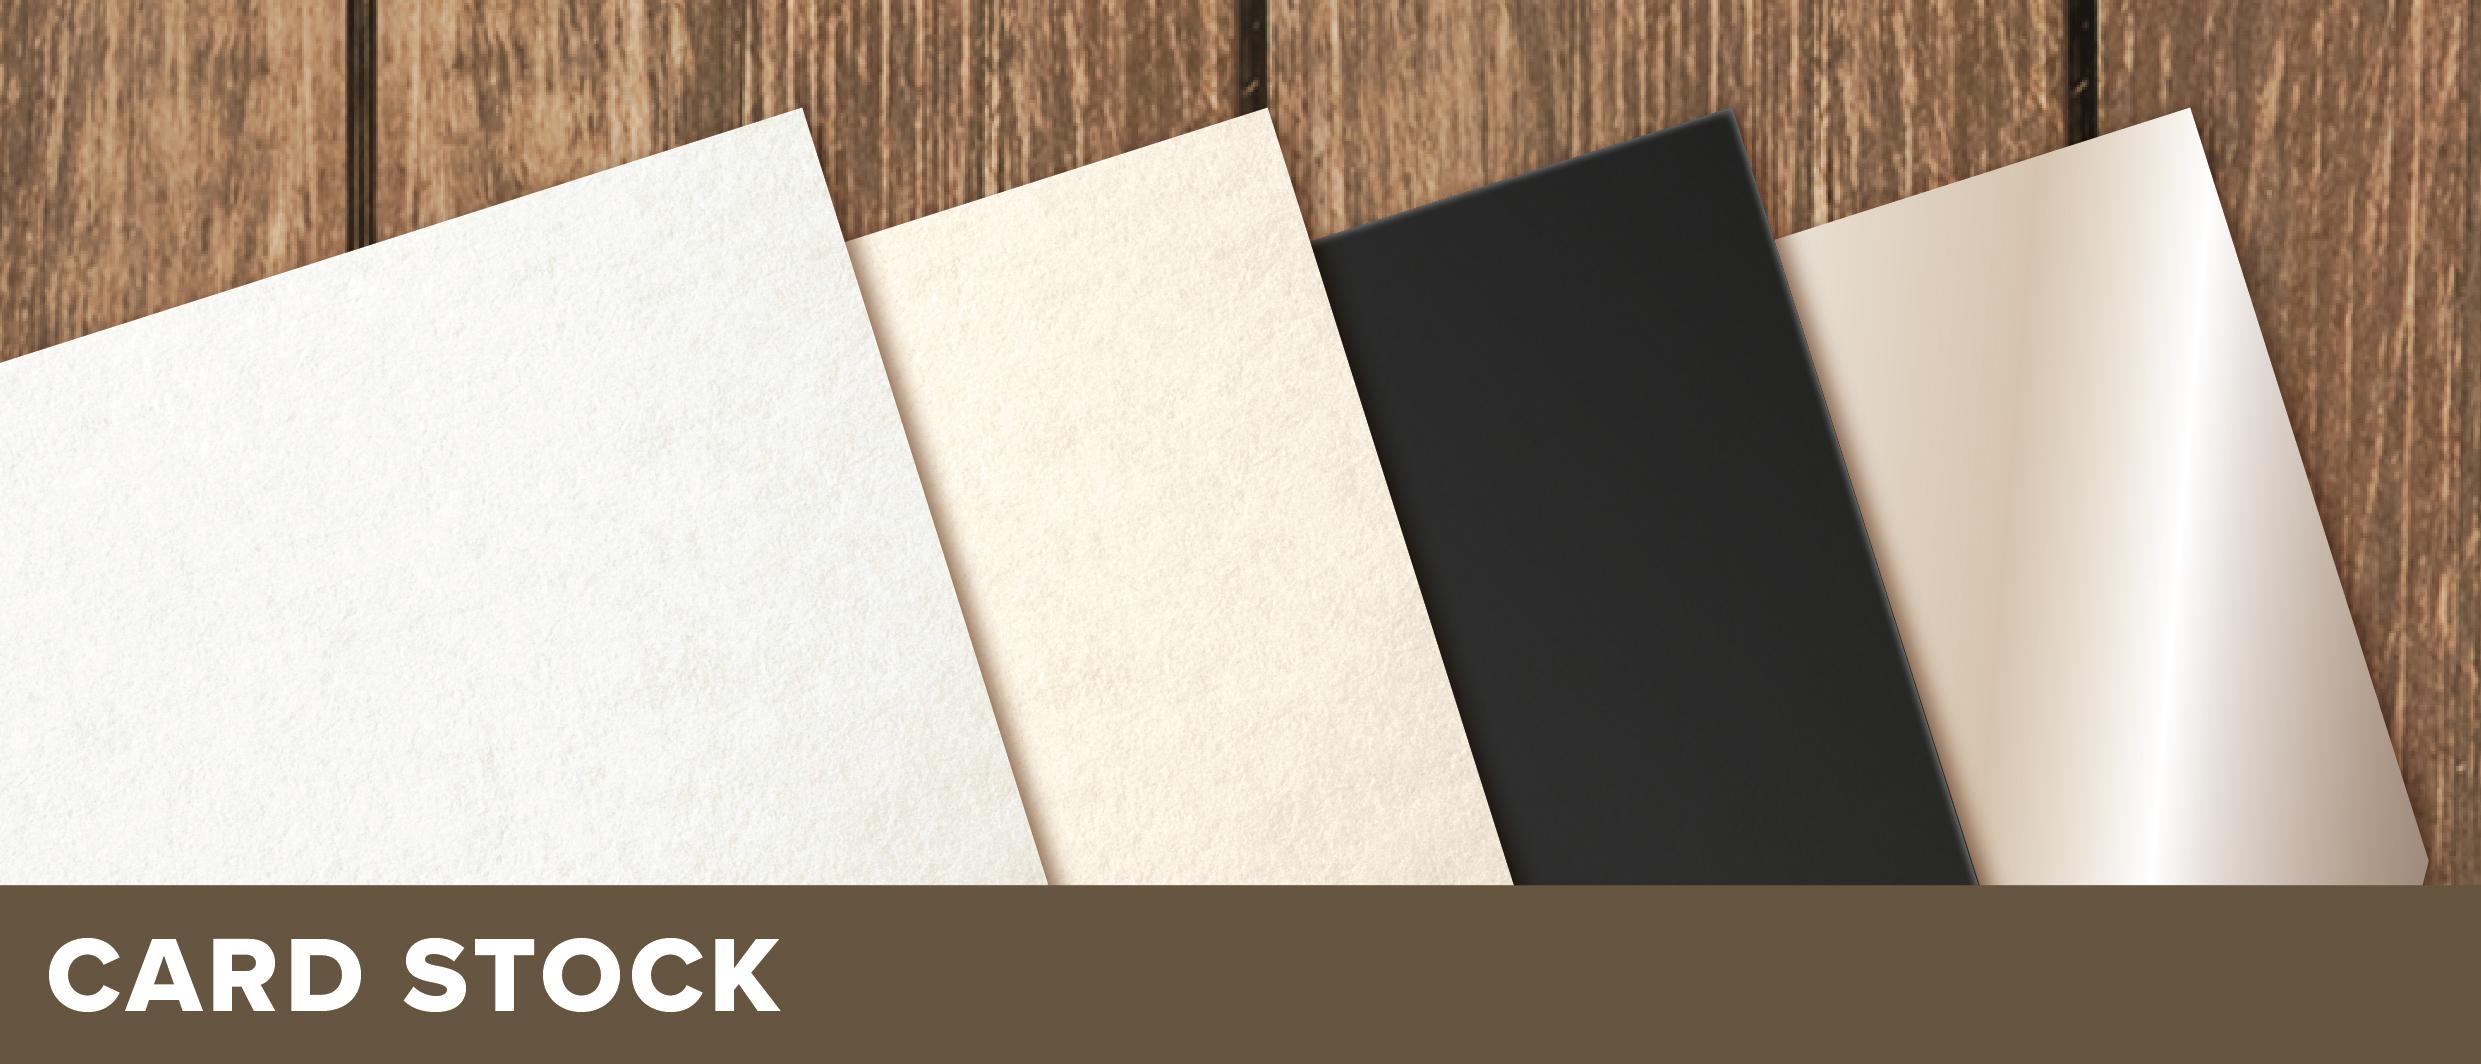 White, Recycled, Blackboard or Metallic